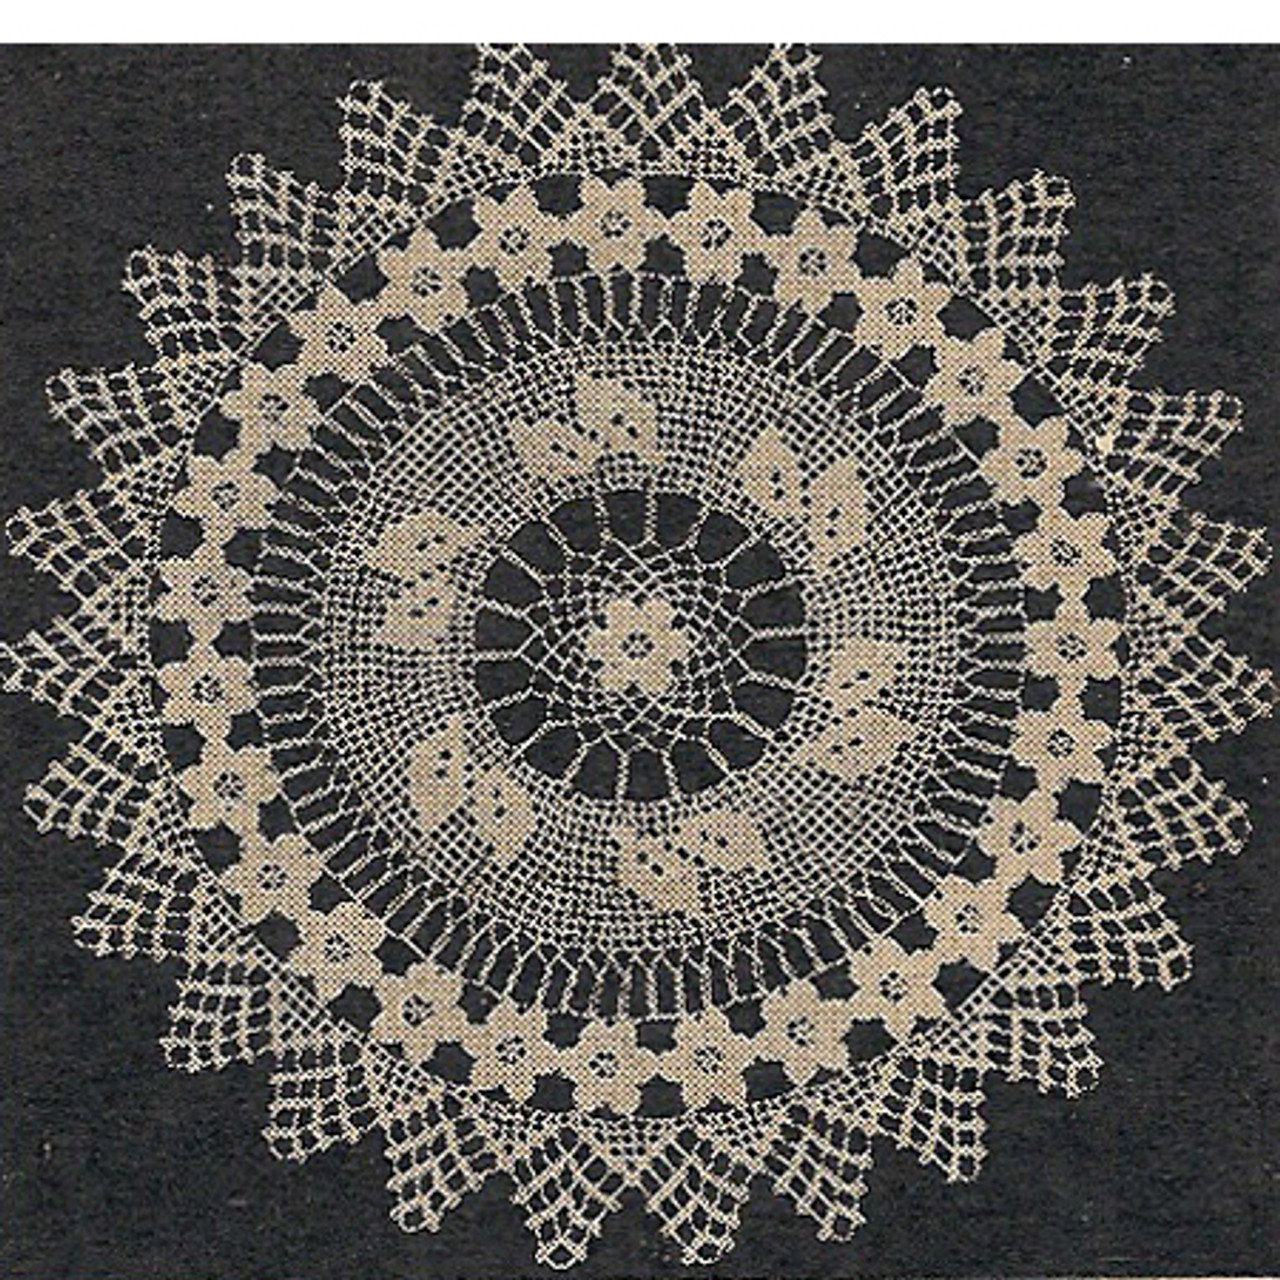 Workbasket Filet Crochet Rose Doily Pattern